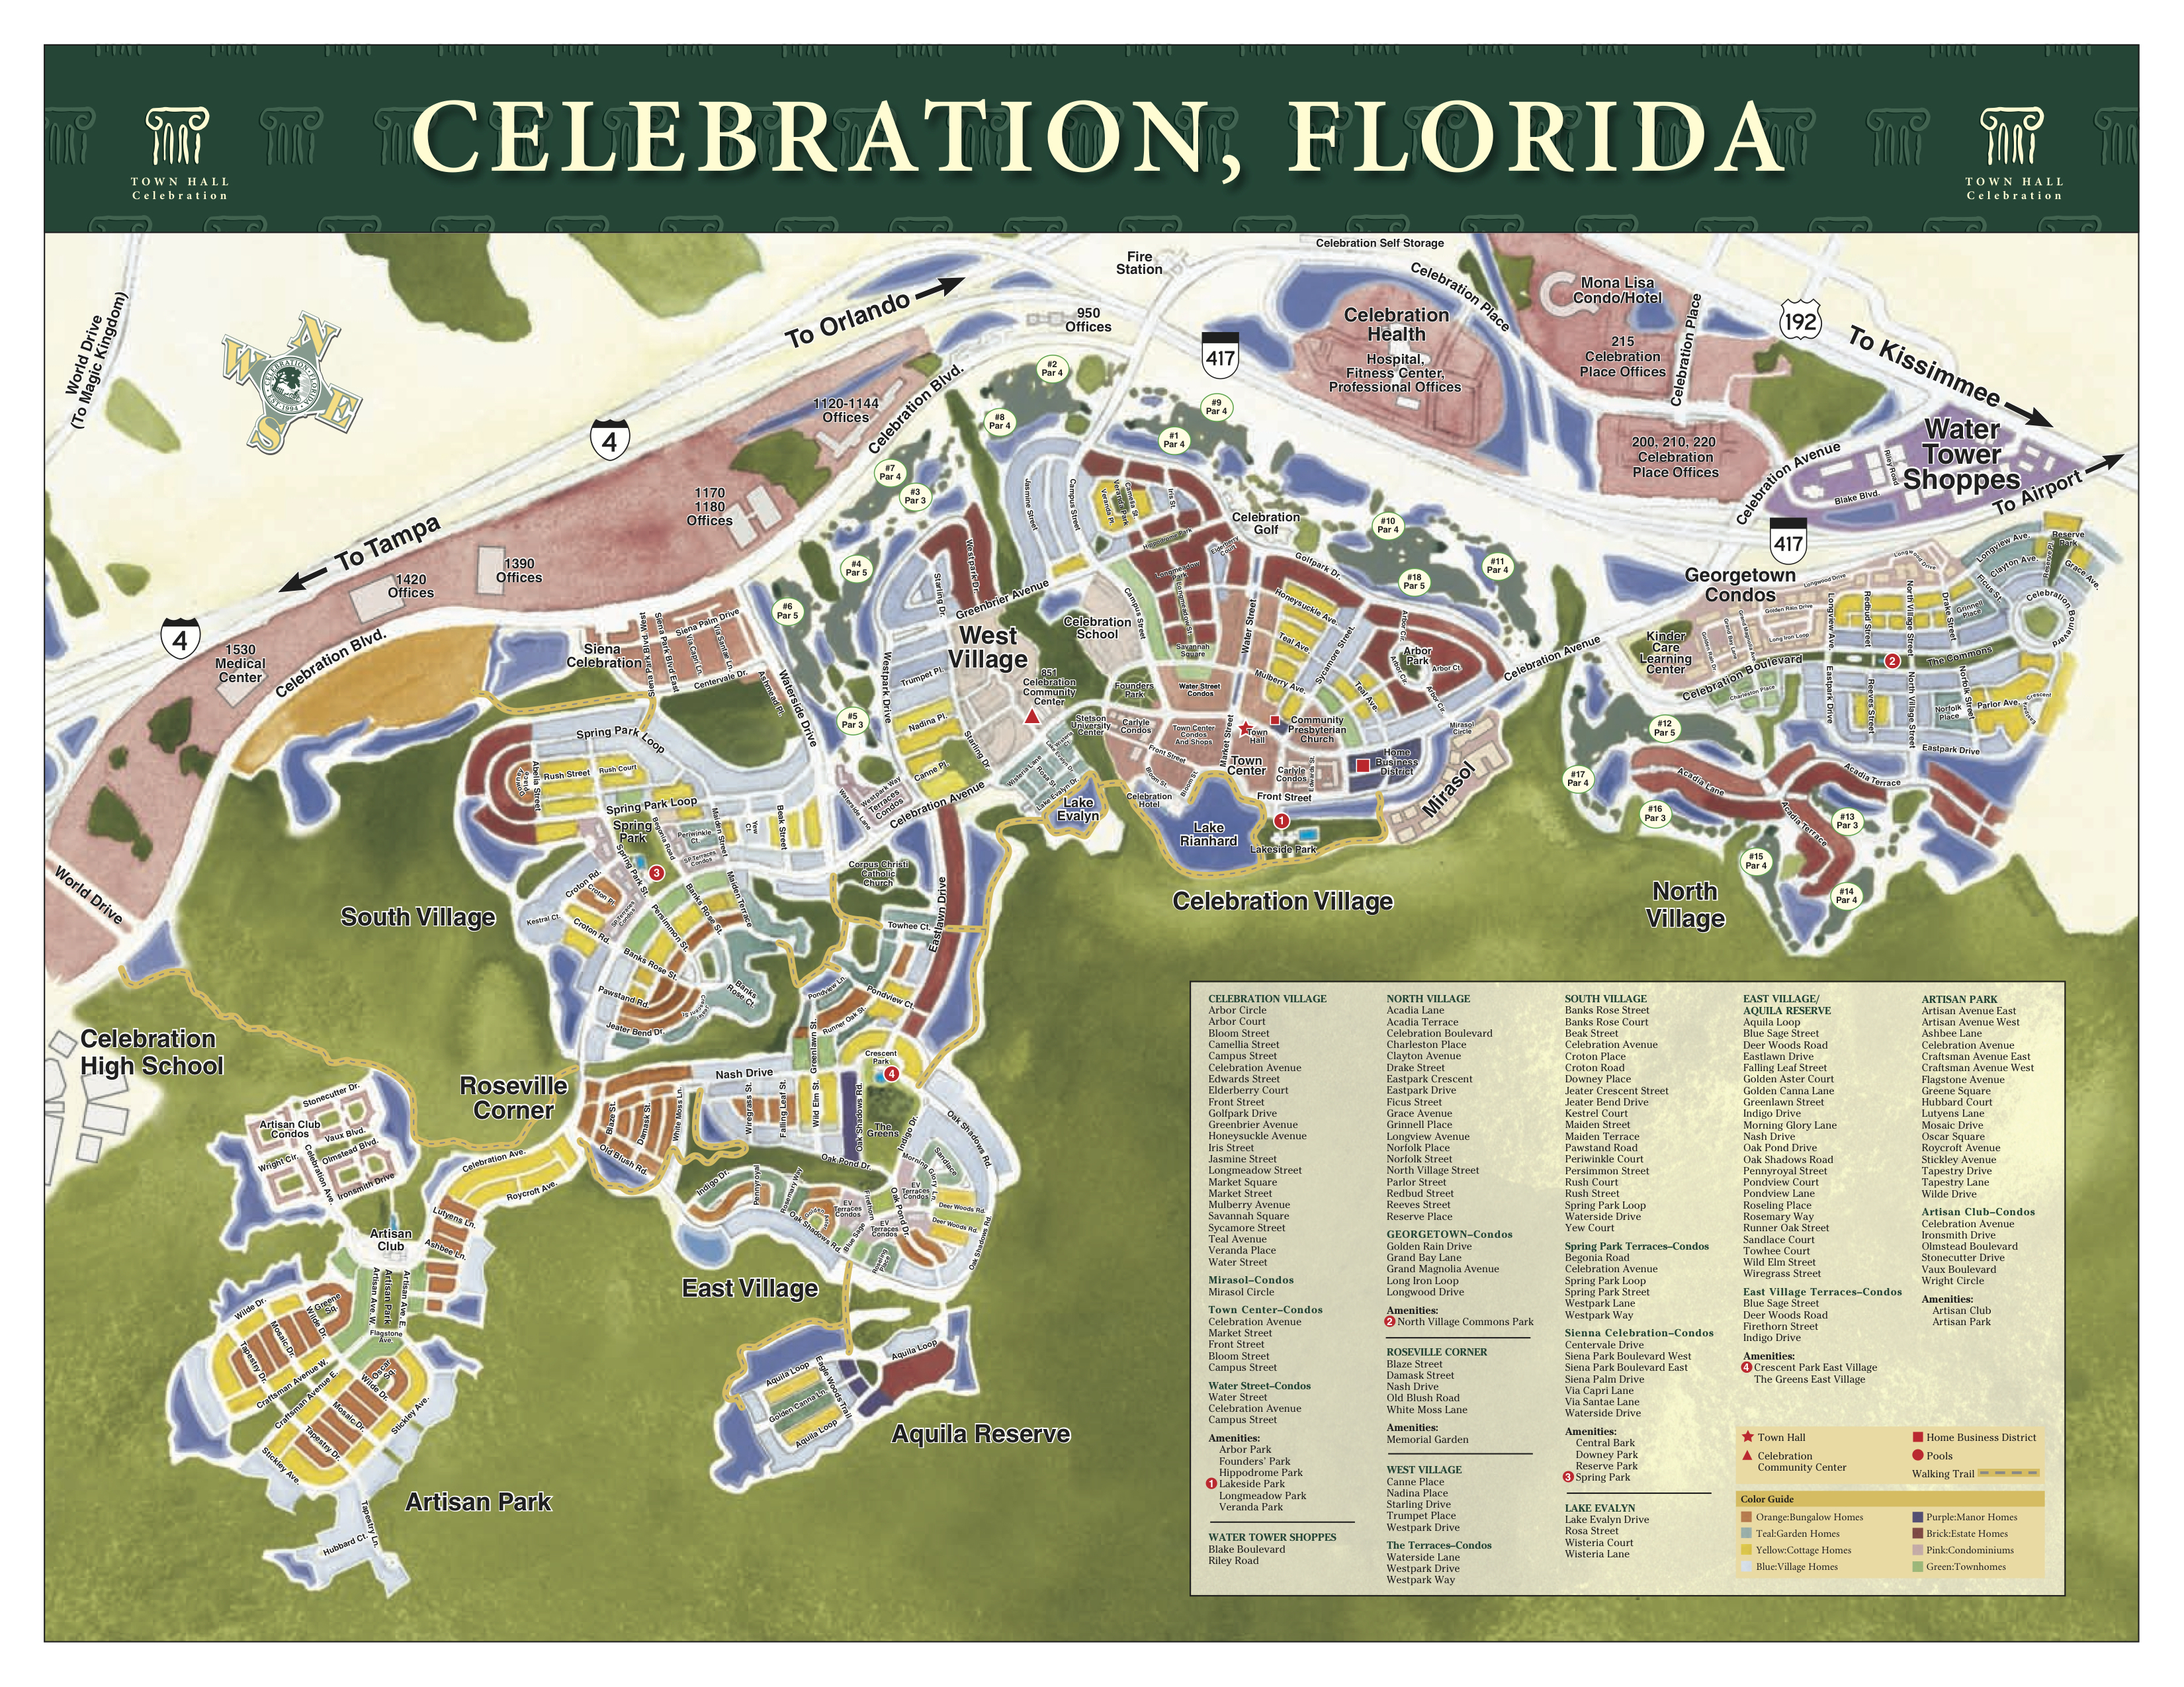 Celebration, Fl Real Estate - Mls Listings Florida Map